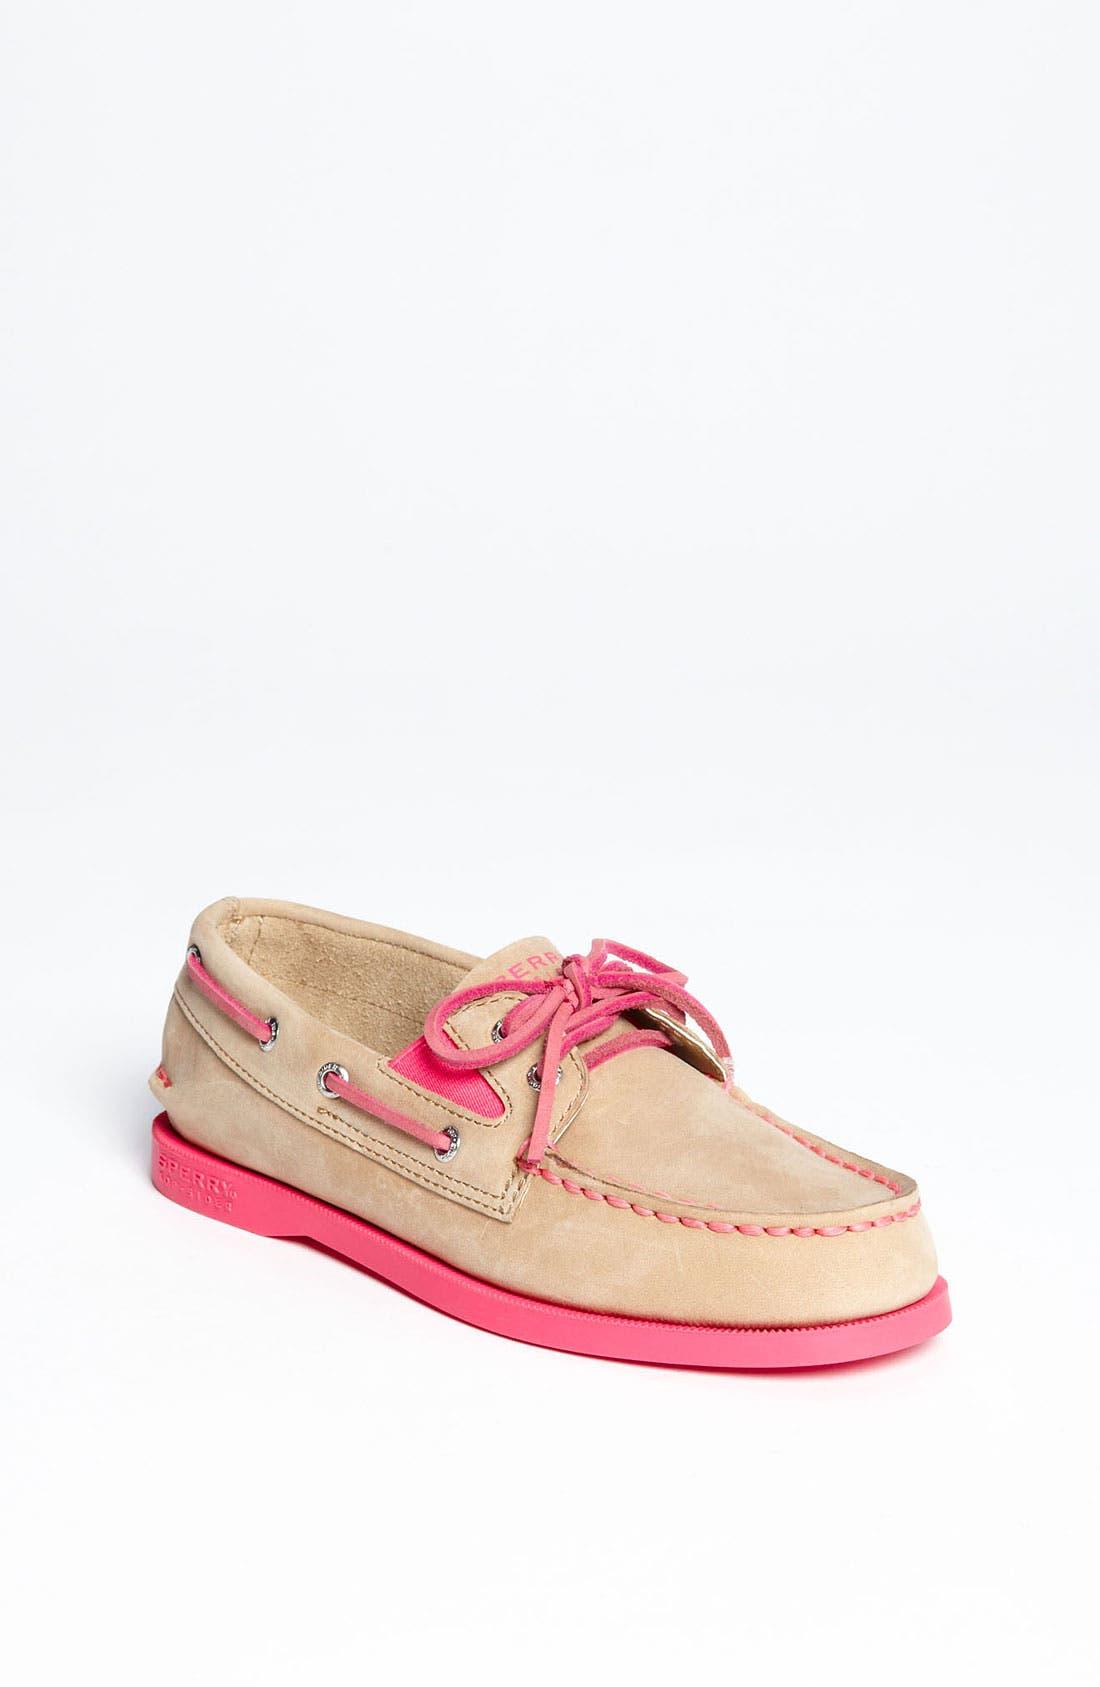 Alternate Image 1 Selected - Sperry Top-Sider® Kids 'Authentic Original' Boat Shoe (Walker, Toddler, Little Kid & Big Kid)